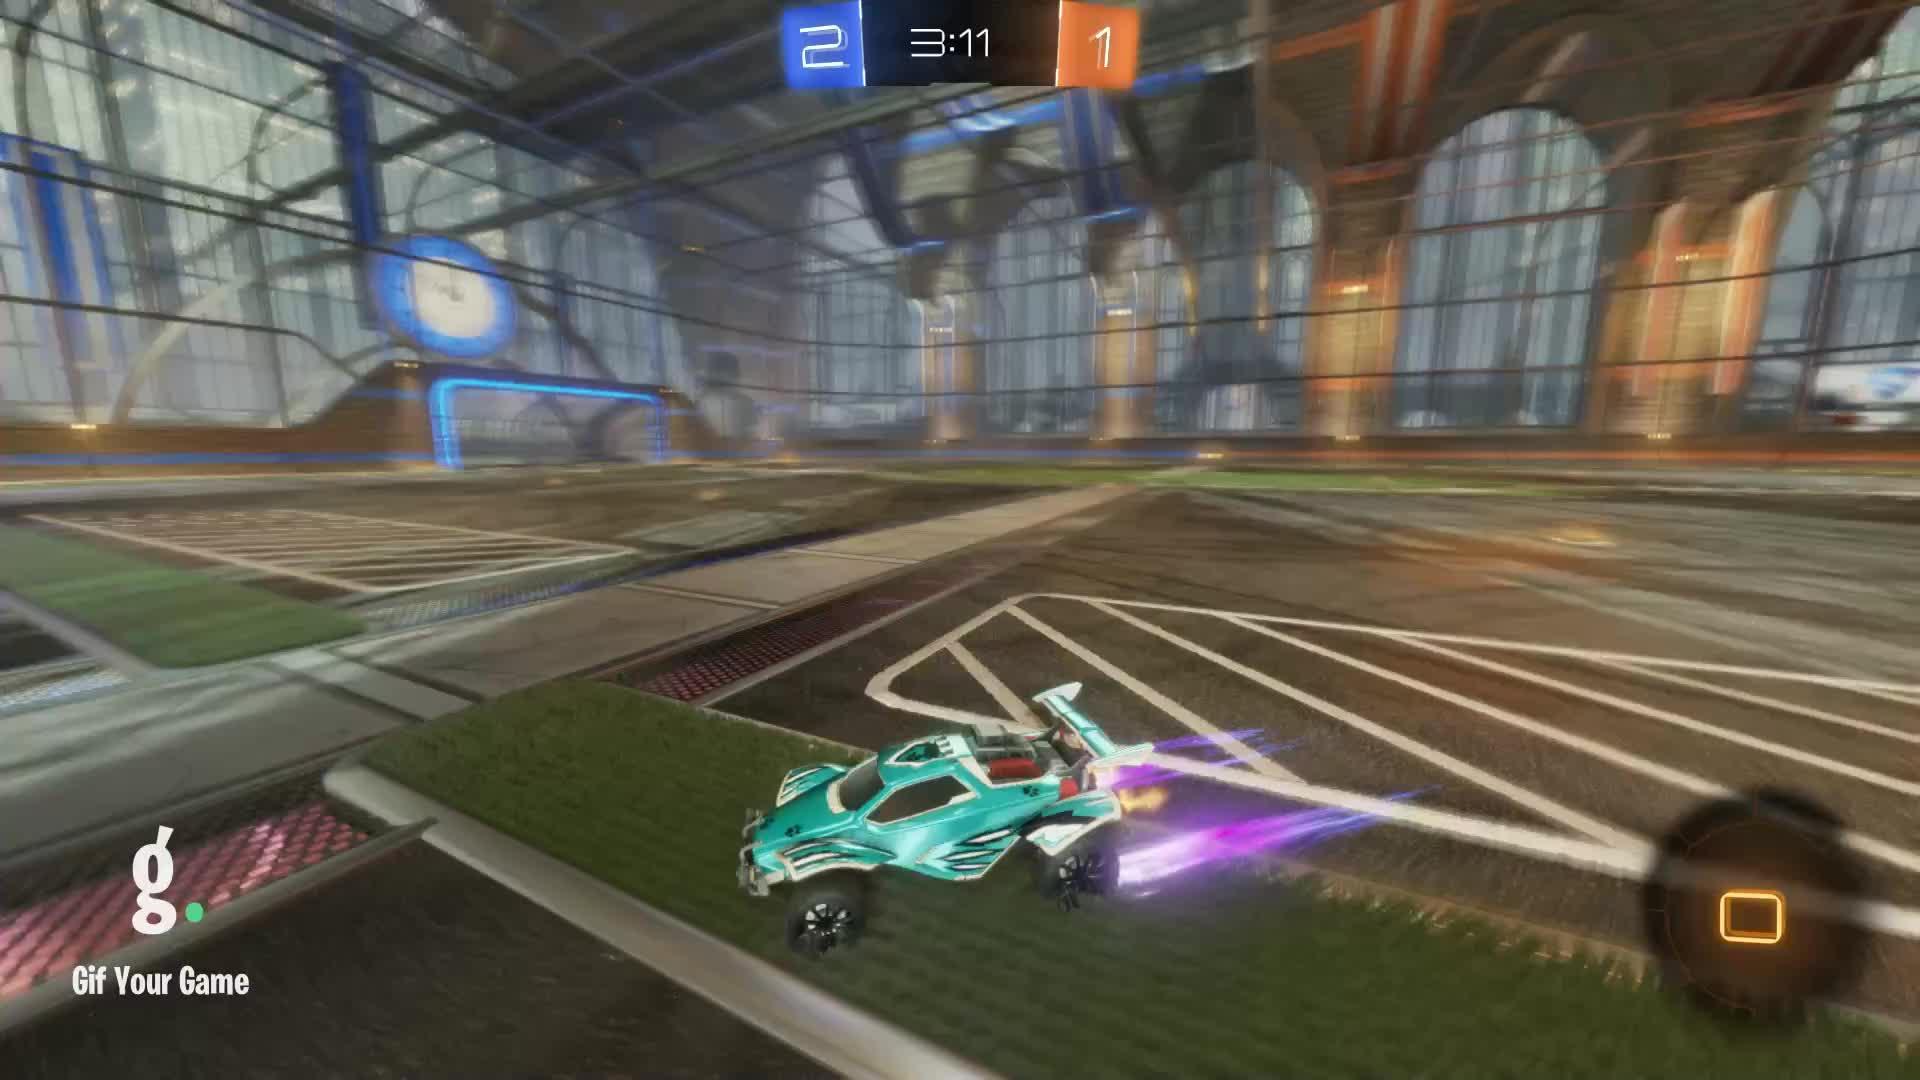 Bezz ^-^, Gif Your Game, GifYourGame, Goal, Rocket League, RocketLeague, Goal 4: Bezz ^-^ GIFs